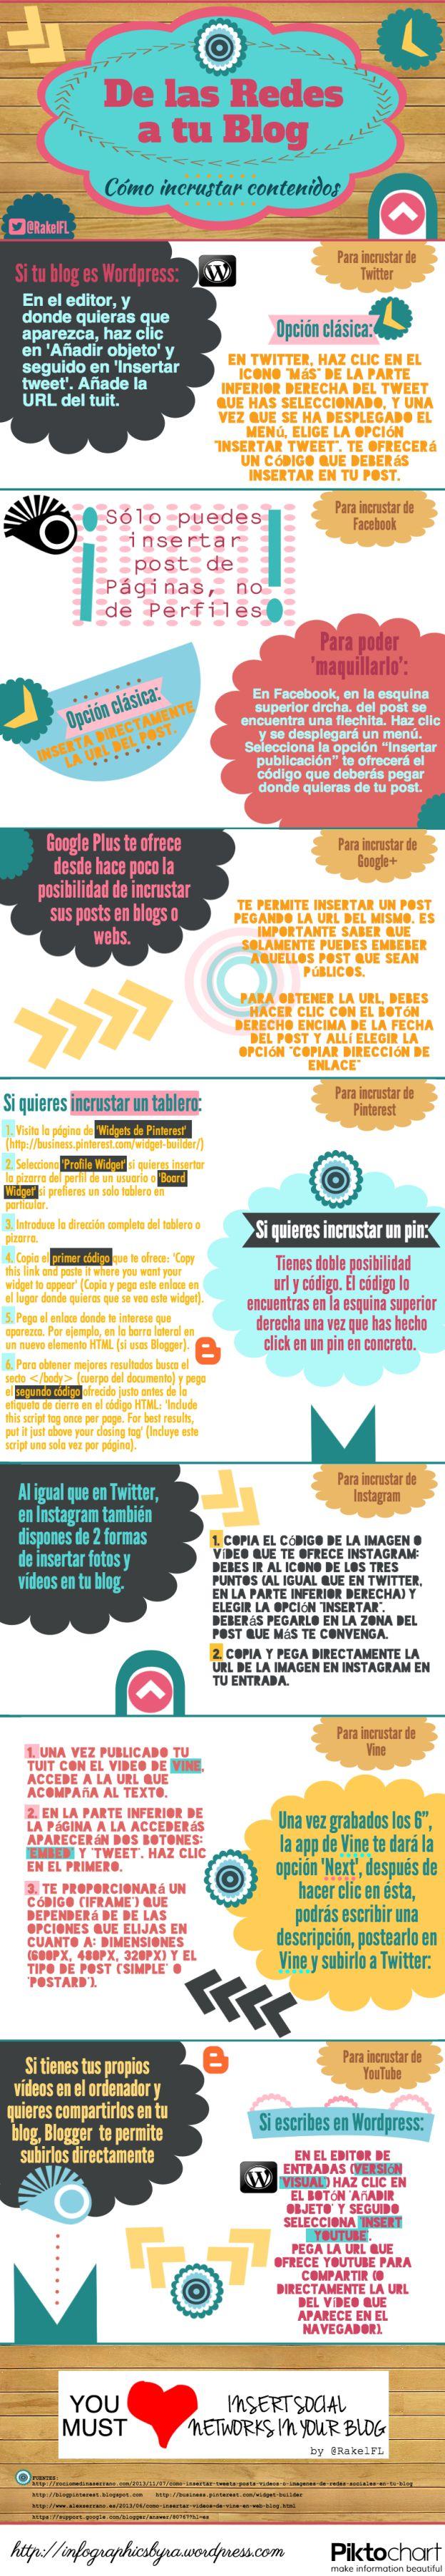 Cómo incrustar contenidos de las redes a tu blog #infografia #infographic #socialmedia